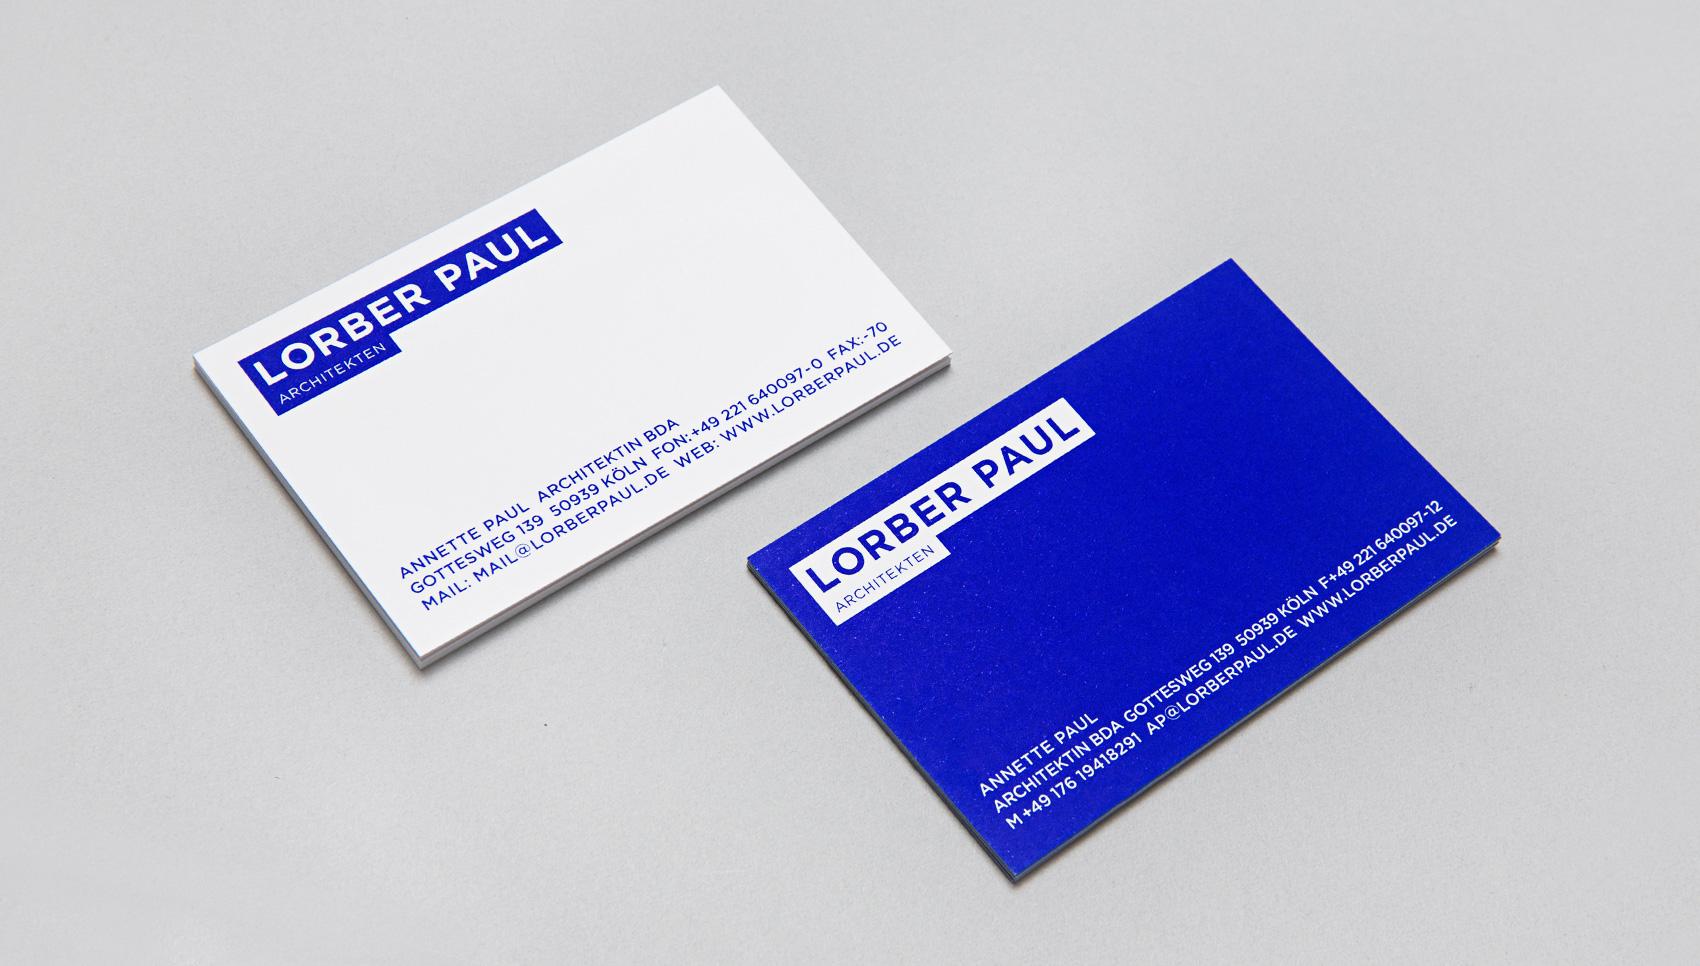 Lorber Paul Architekten. Corporate Design.